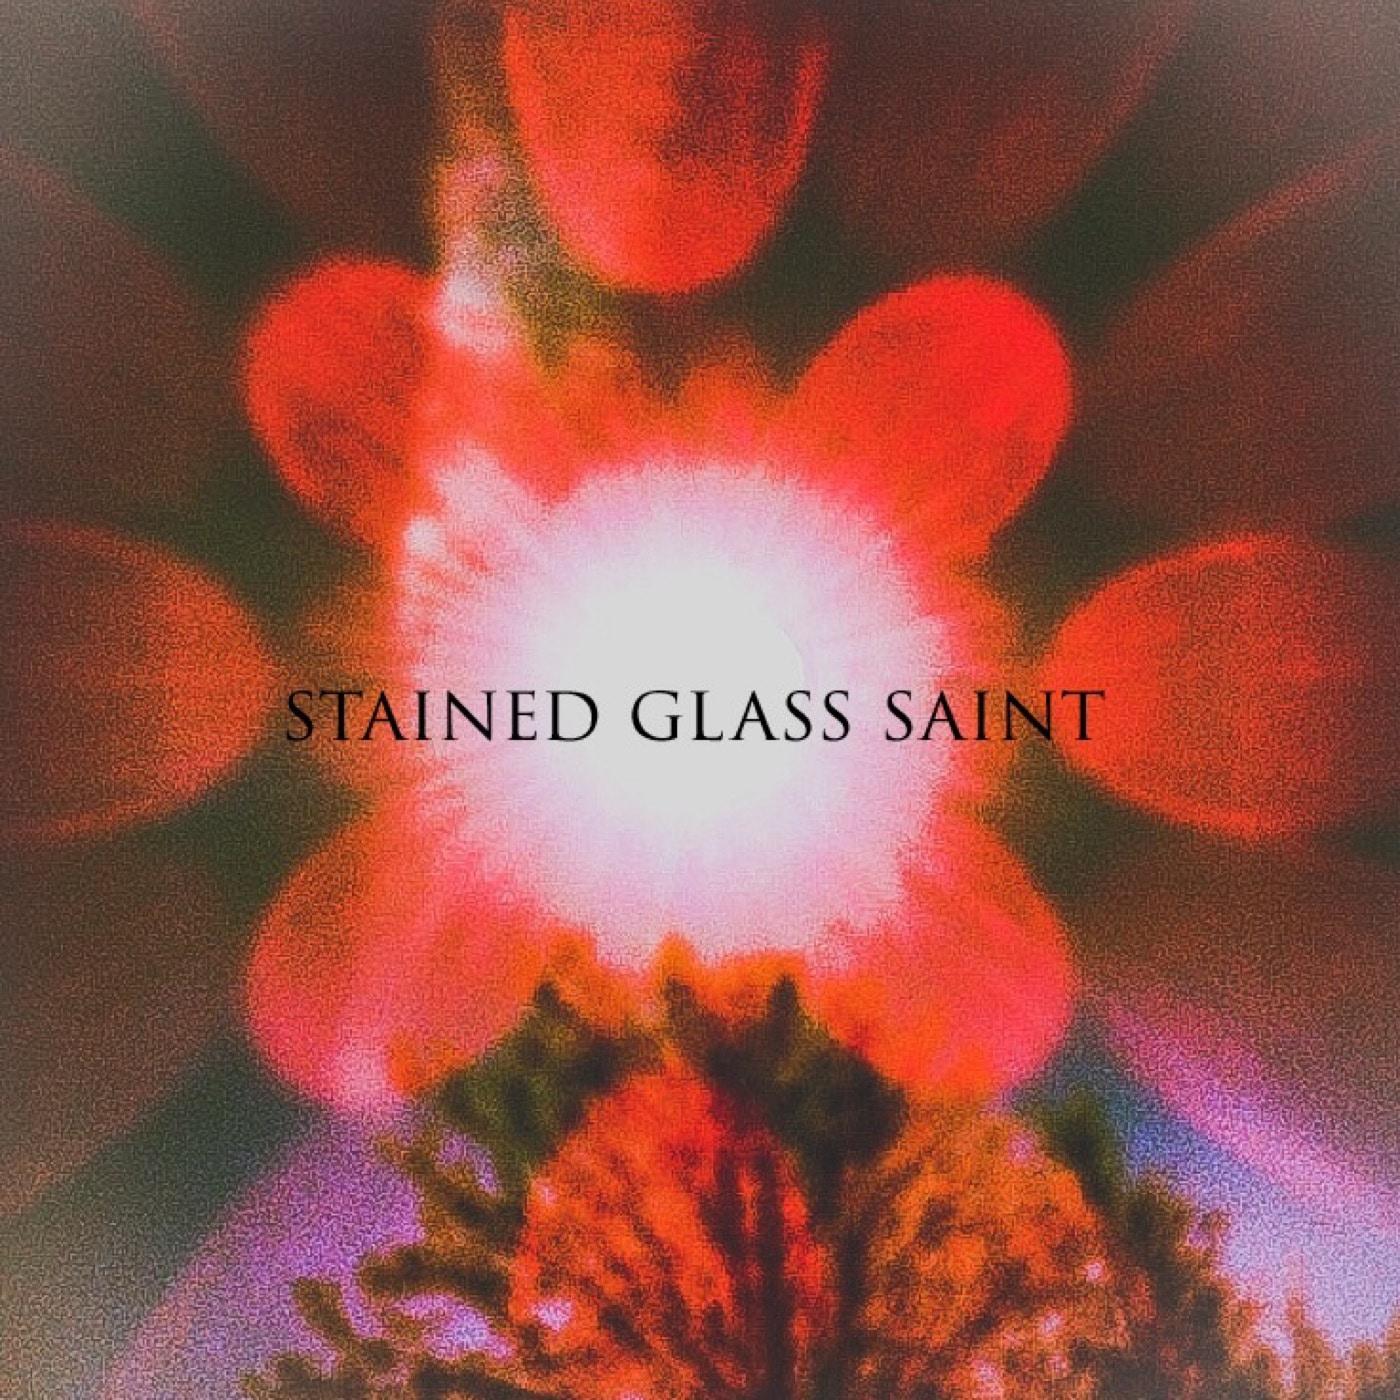 David Stone - Stained Glass Saint